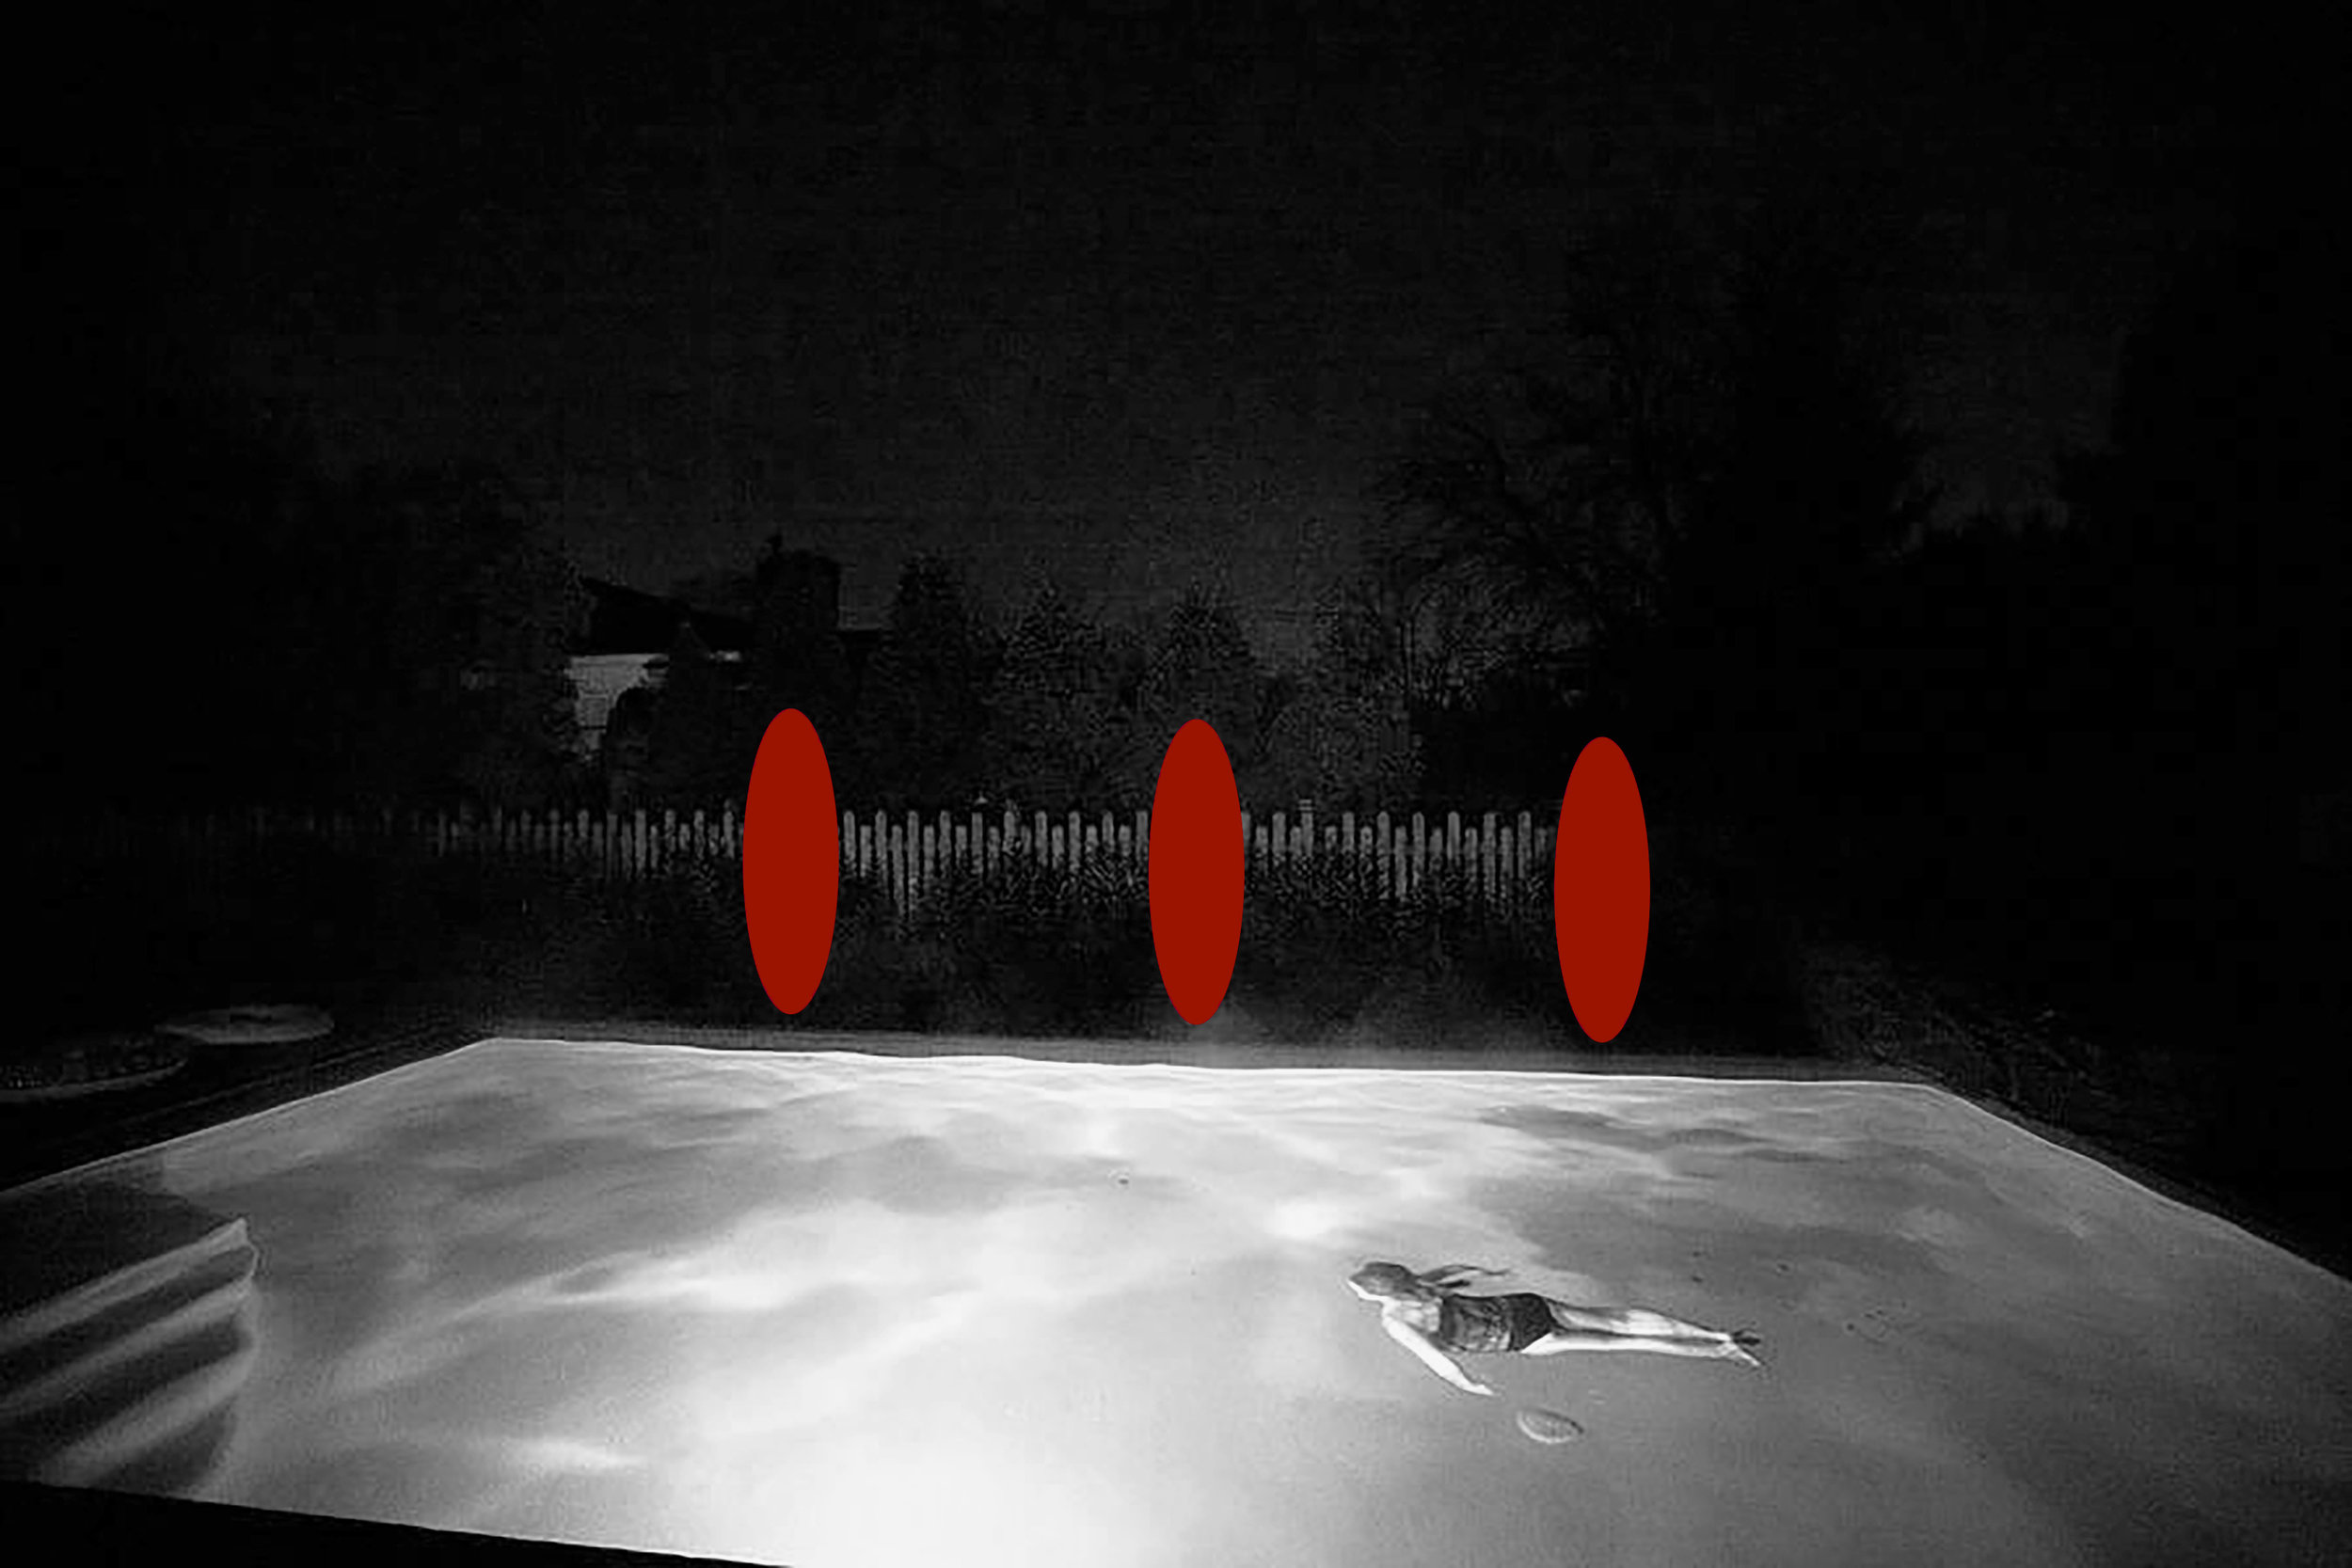 nighttime-image-of-a-girl-swimming-woods-wheatcroft111111111111.jpg